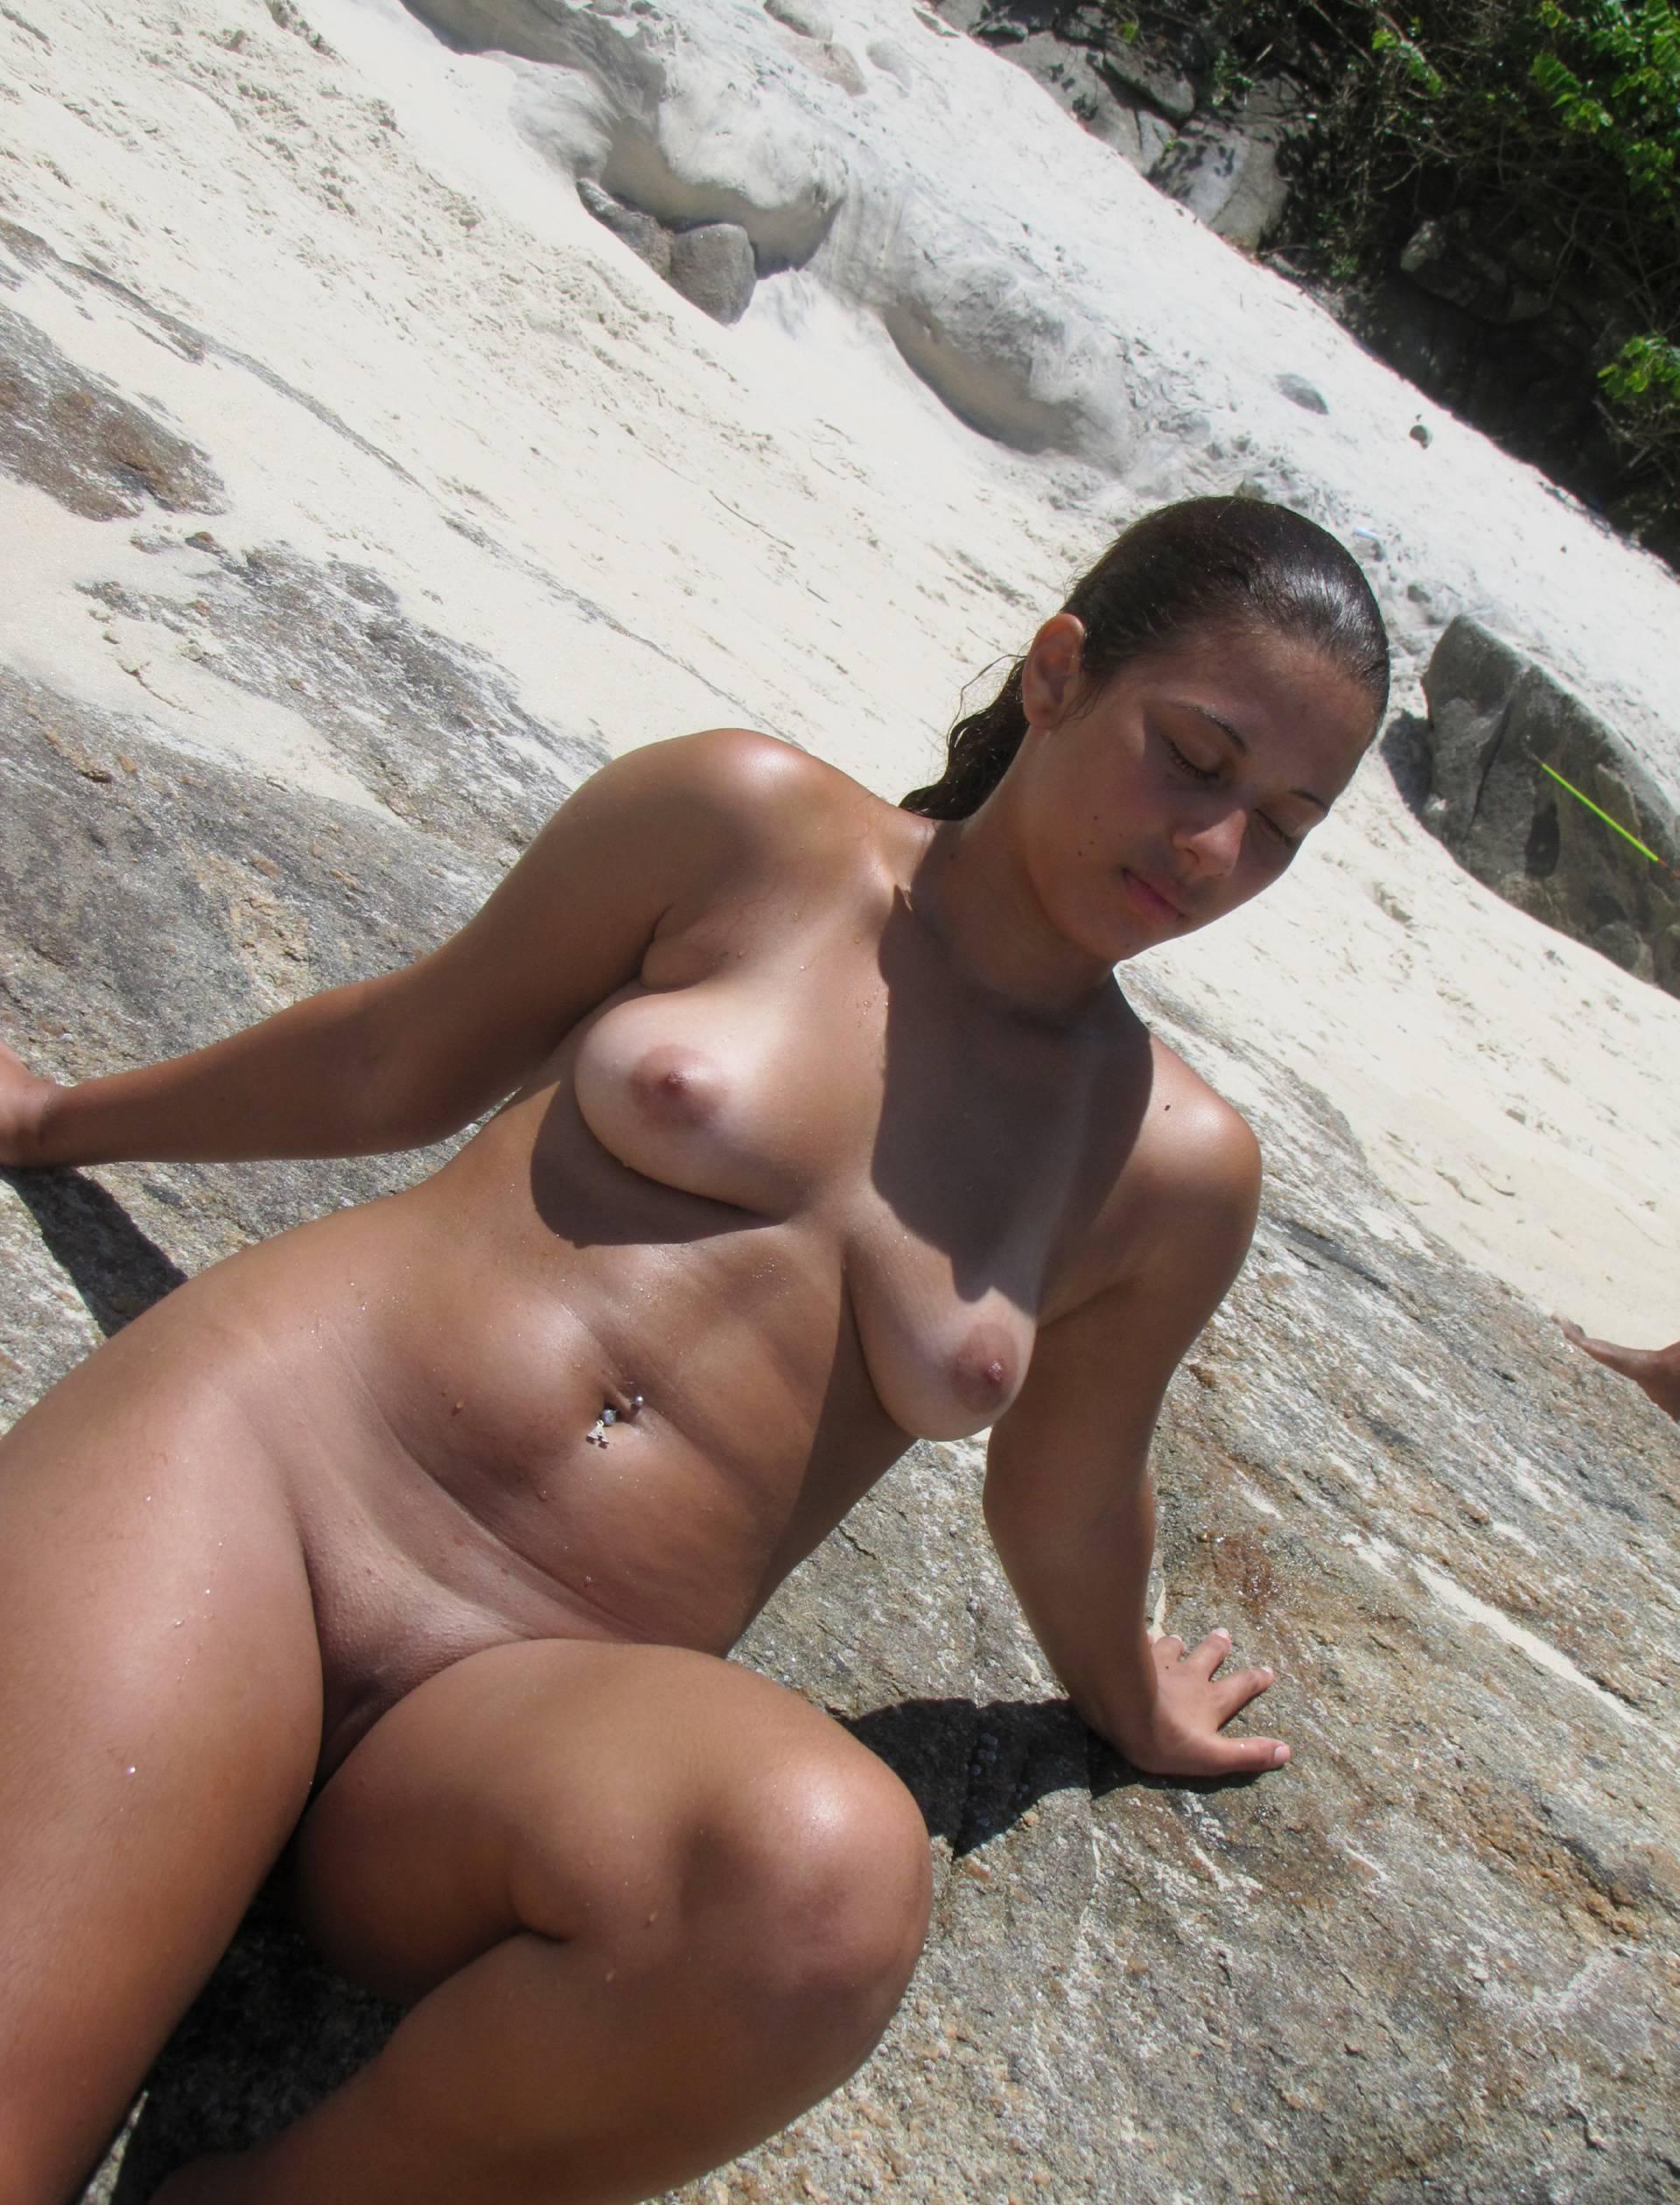 Purenudism Pics Warm Tropic Beach - 1